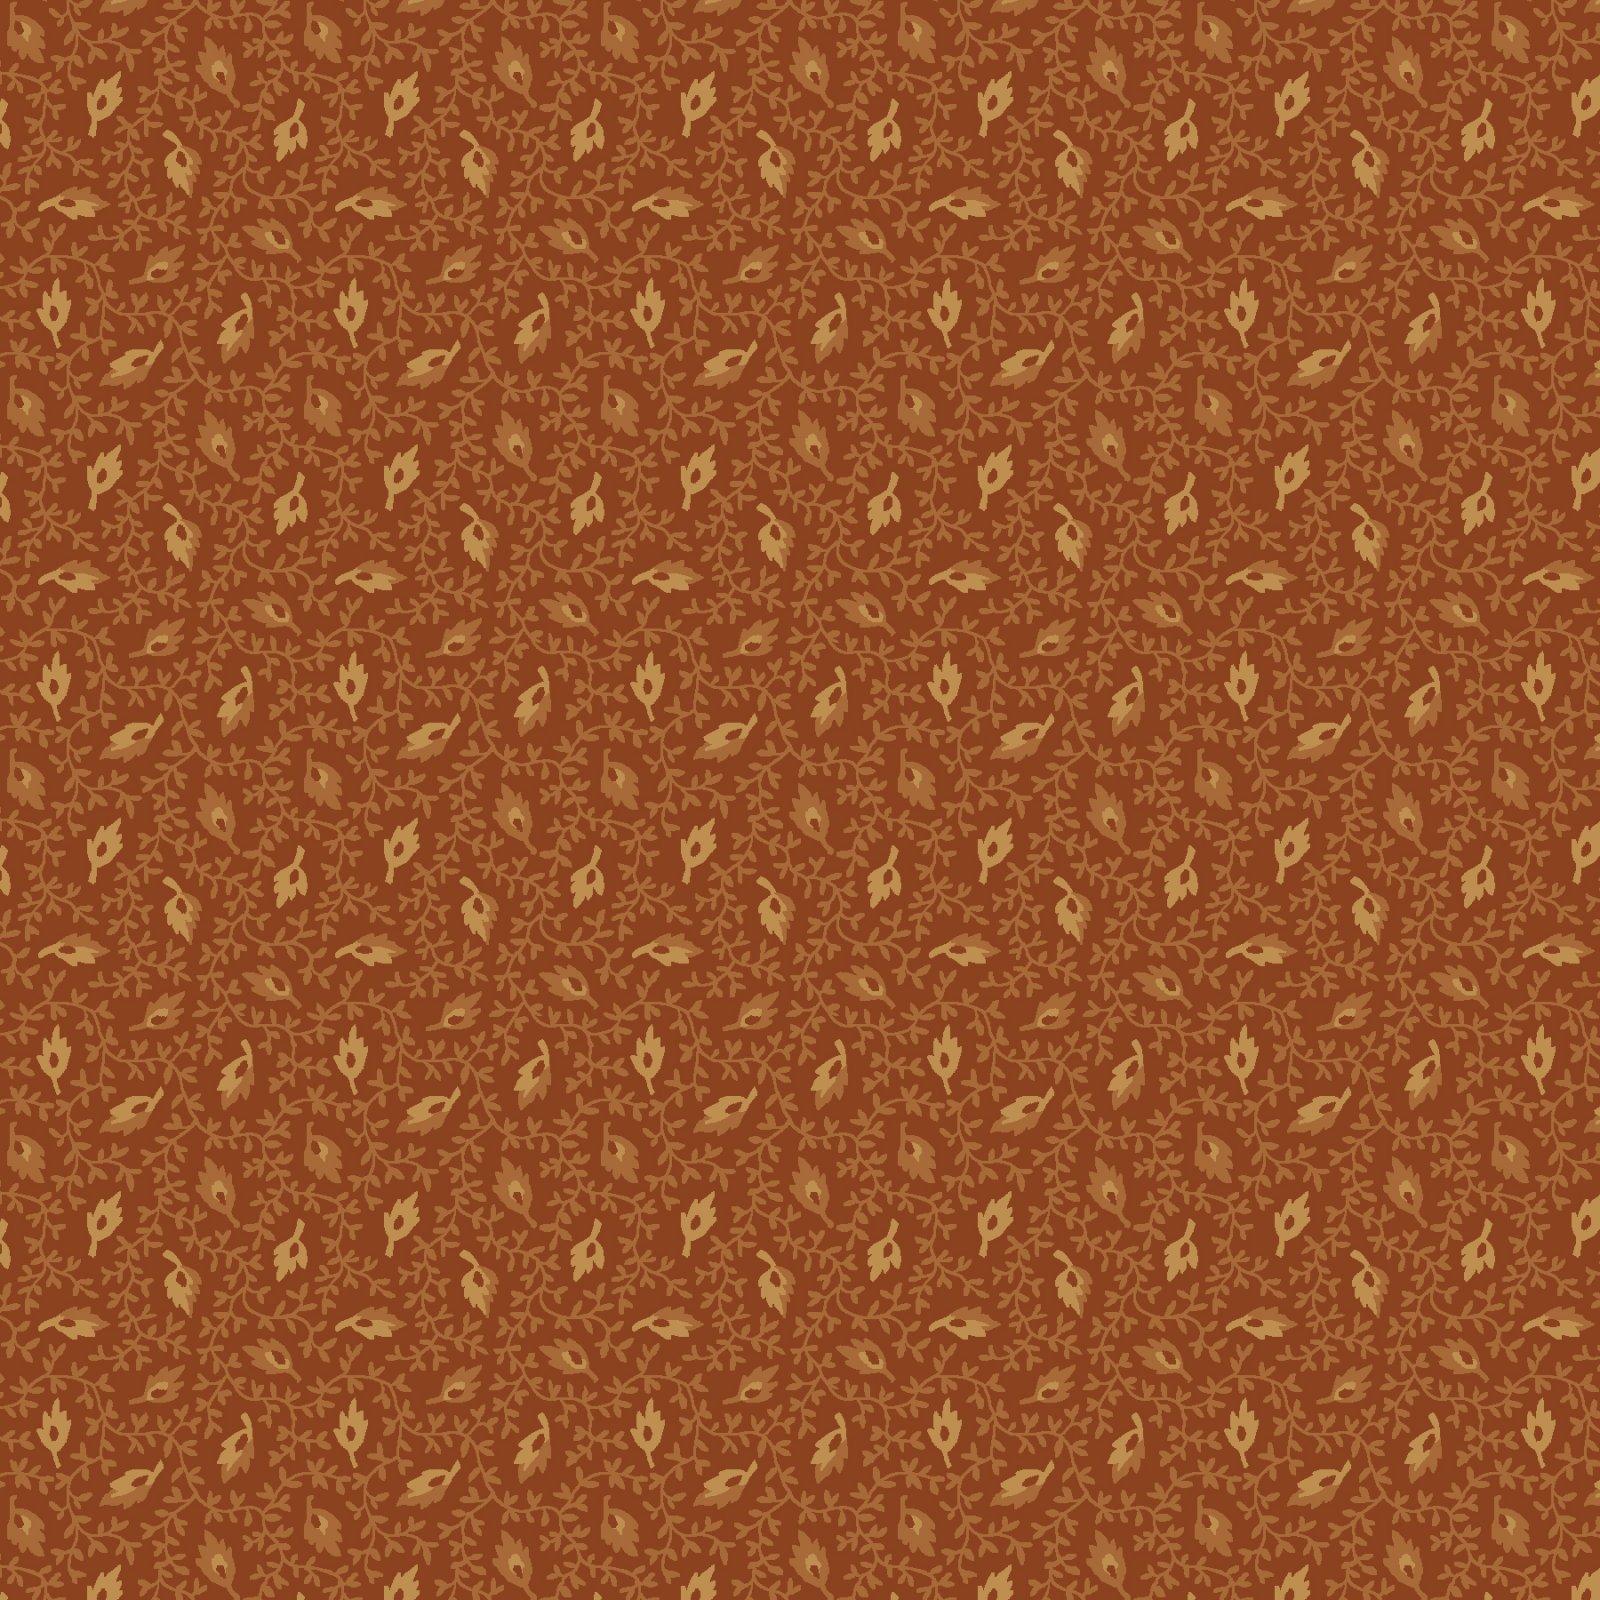 Buttermilk Autumn - 2279-35 * 1/2 yard